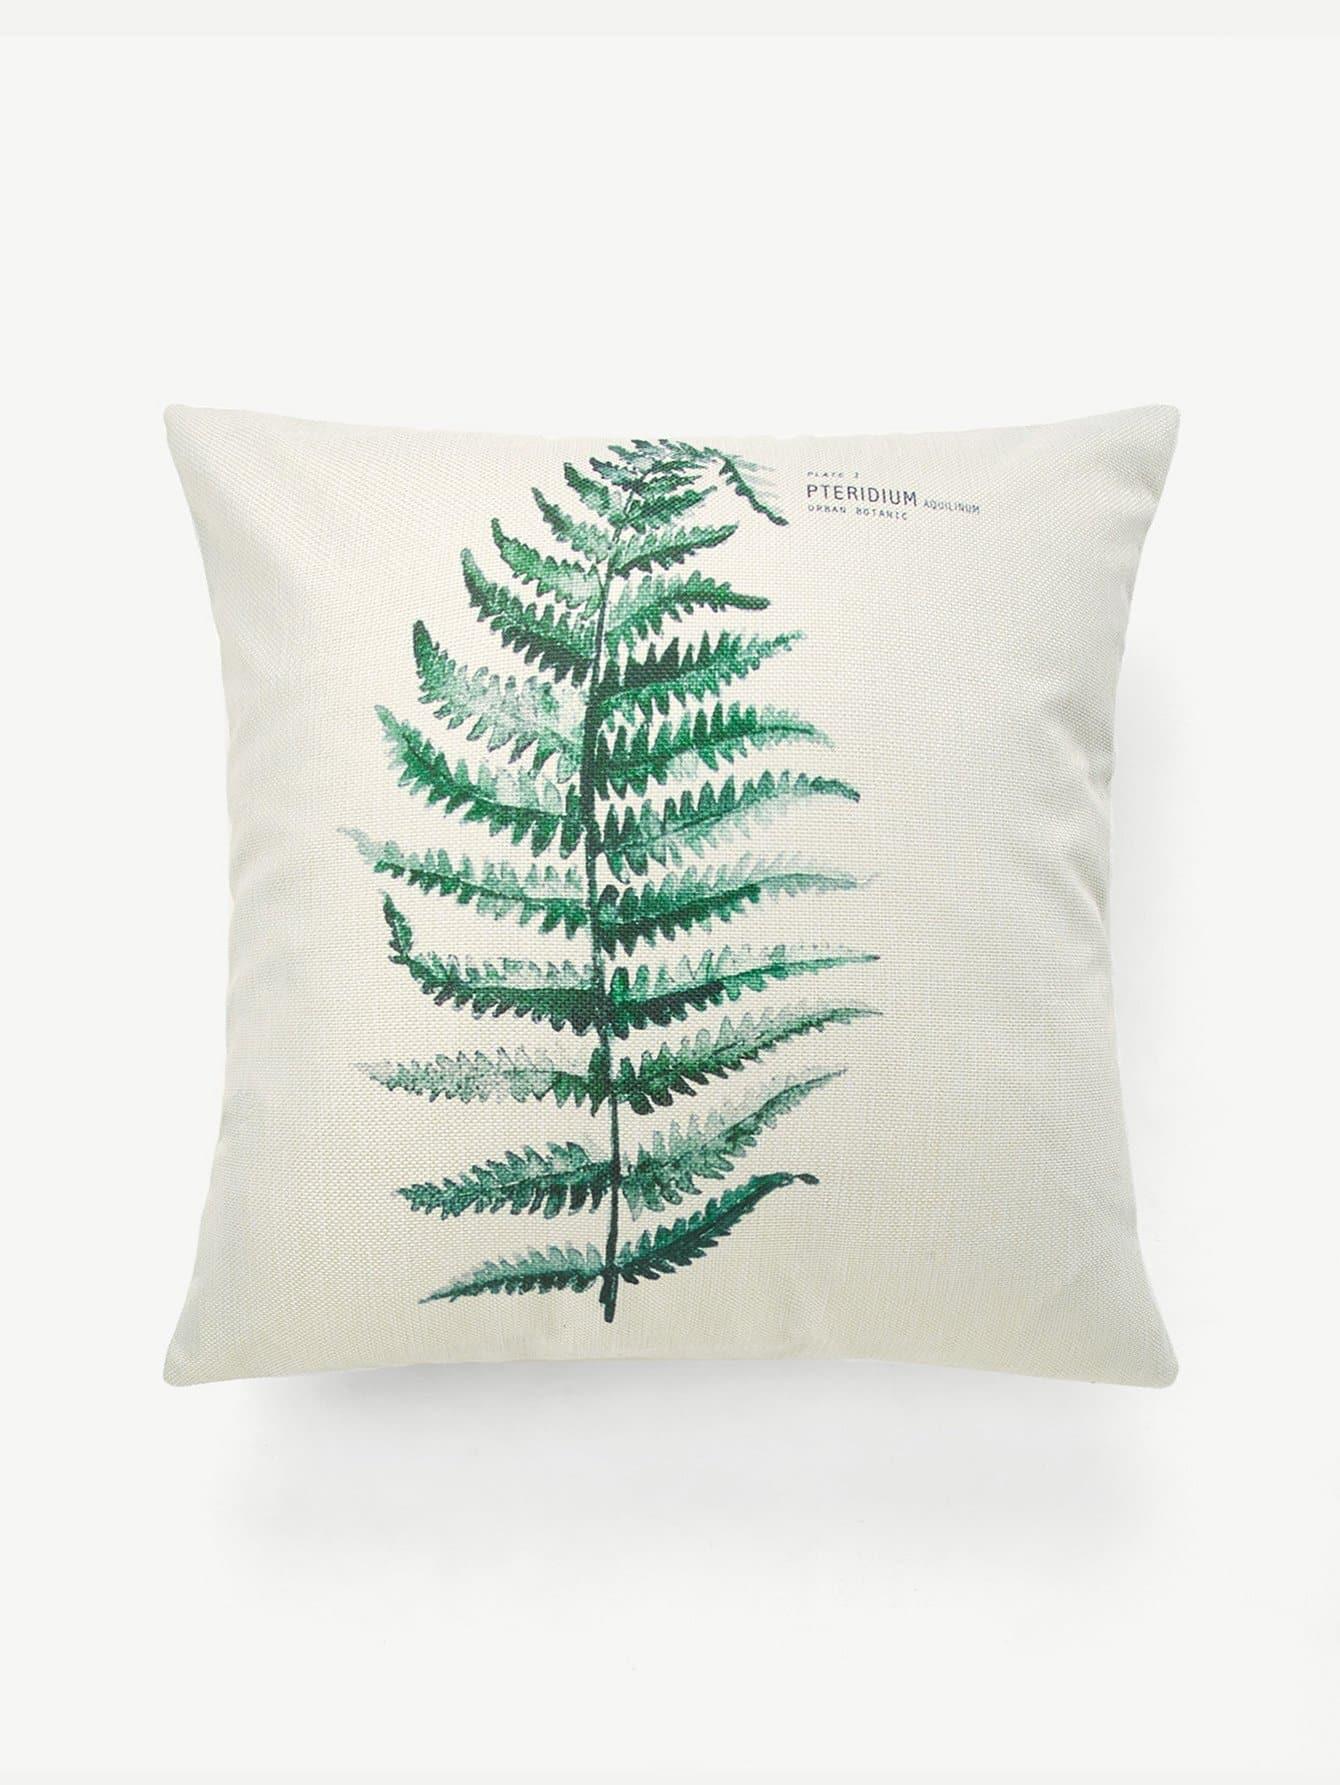 Palm Print Pillowcase Cover panda print linen pillowcase cover